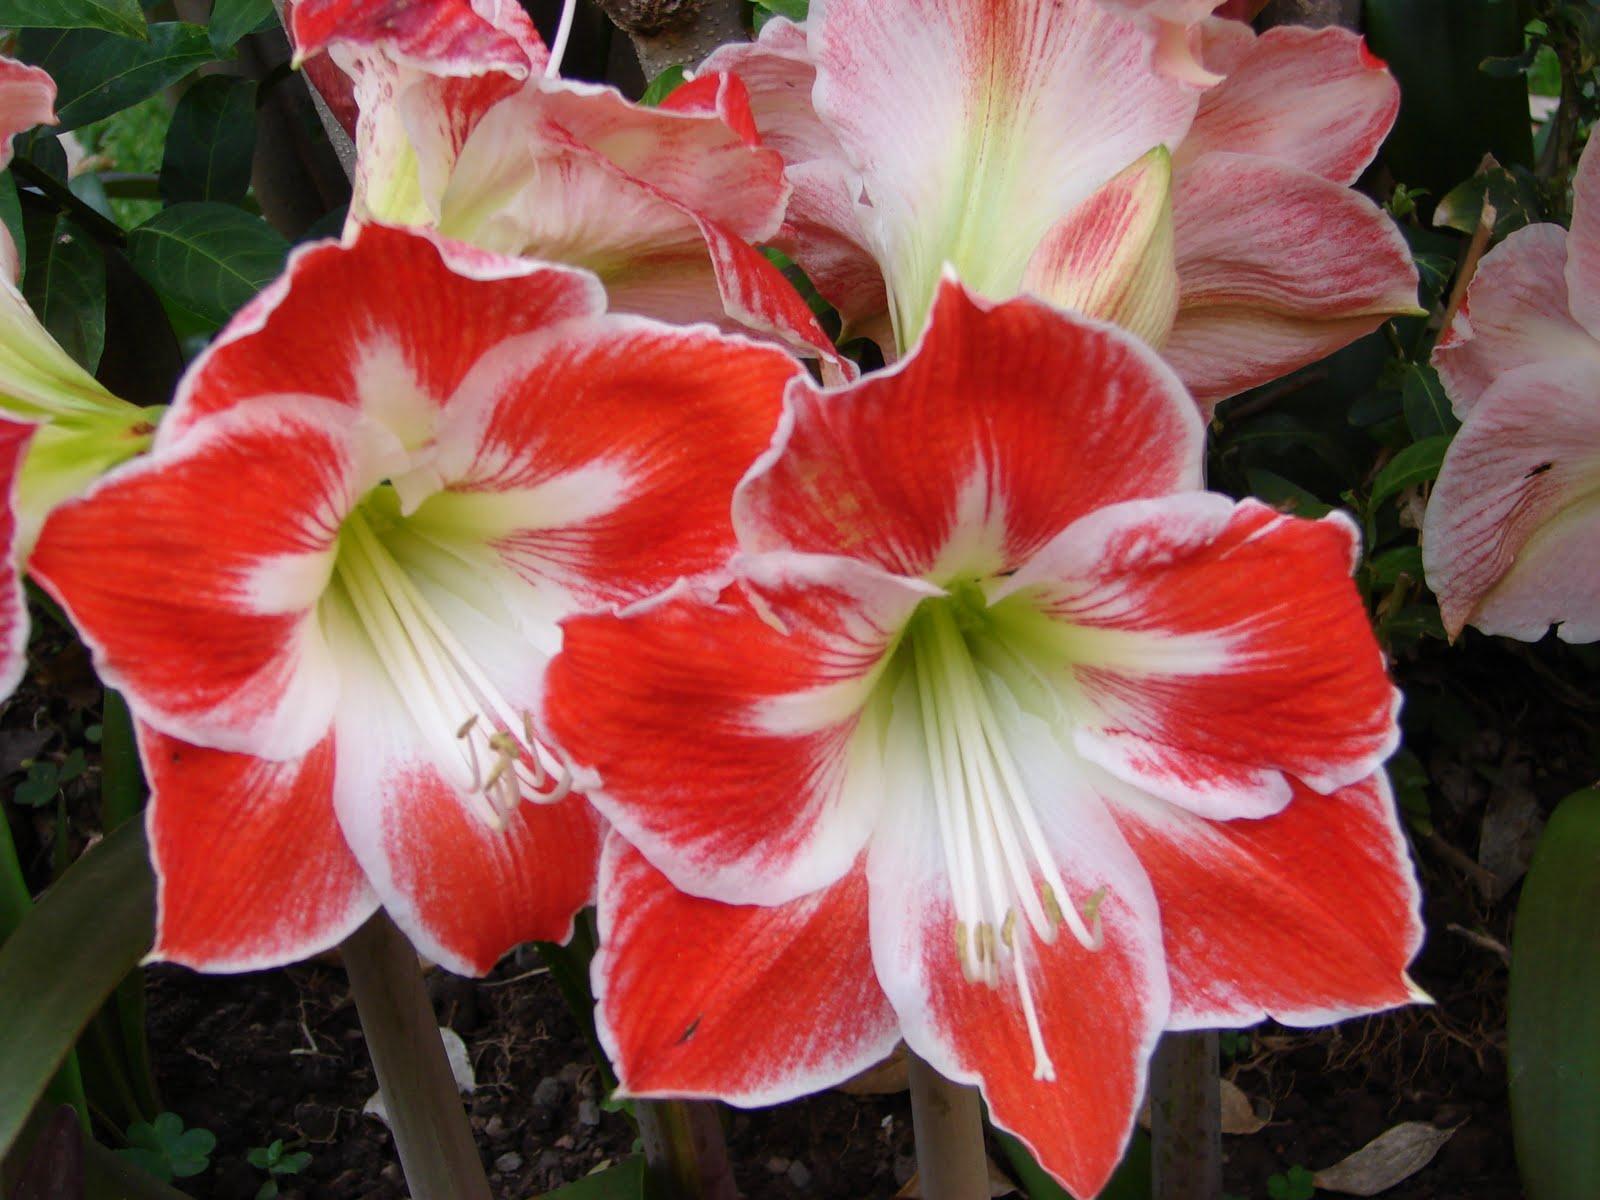 14-noviembre-15-16-17...2010 Diosas Flores Hermosas...